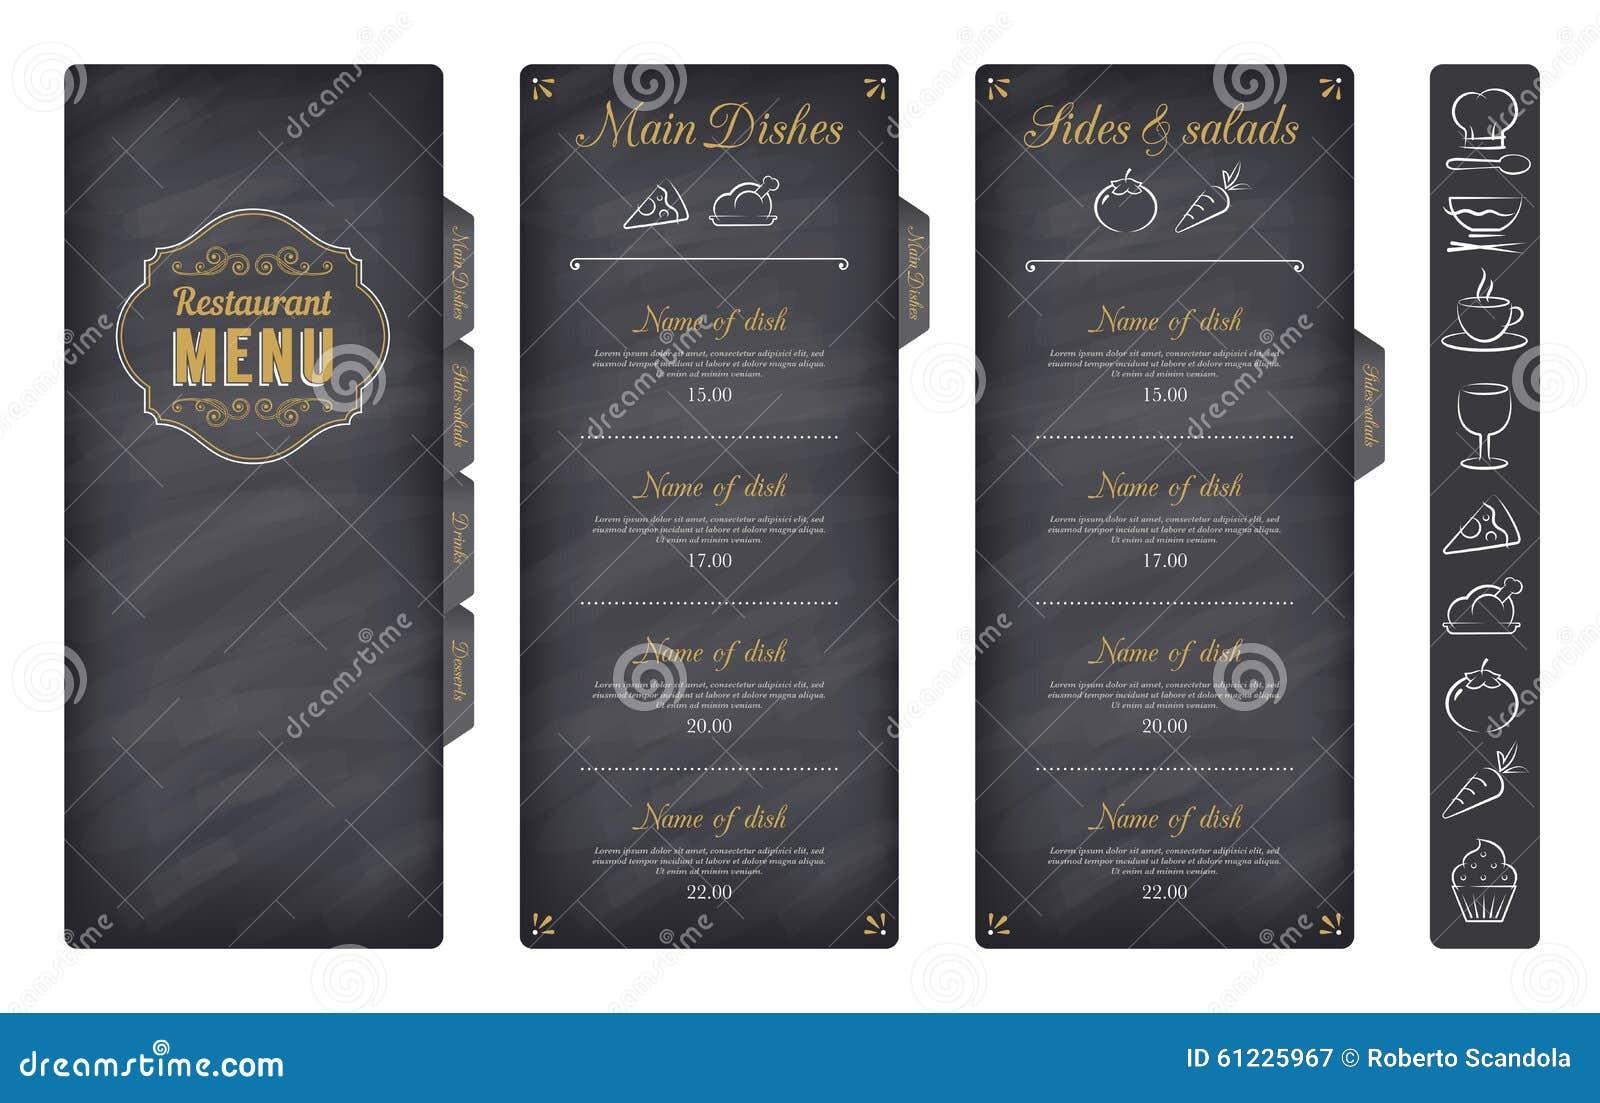 Black Vector Restaurant Menu Template Stock Vector - Image ...